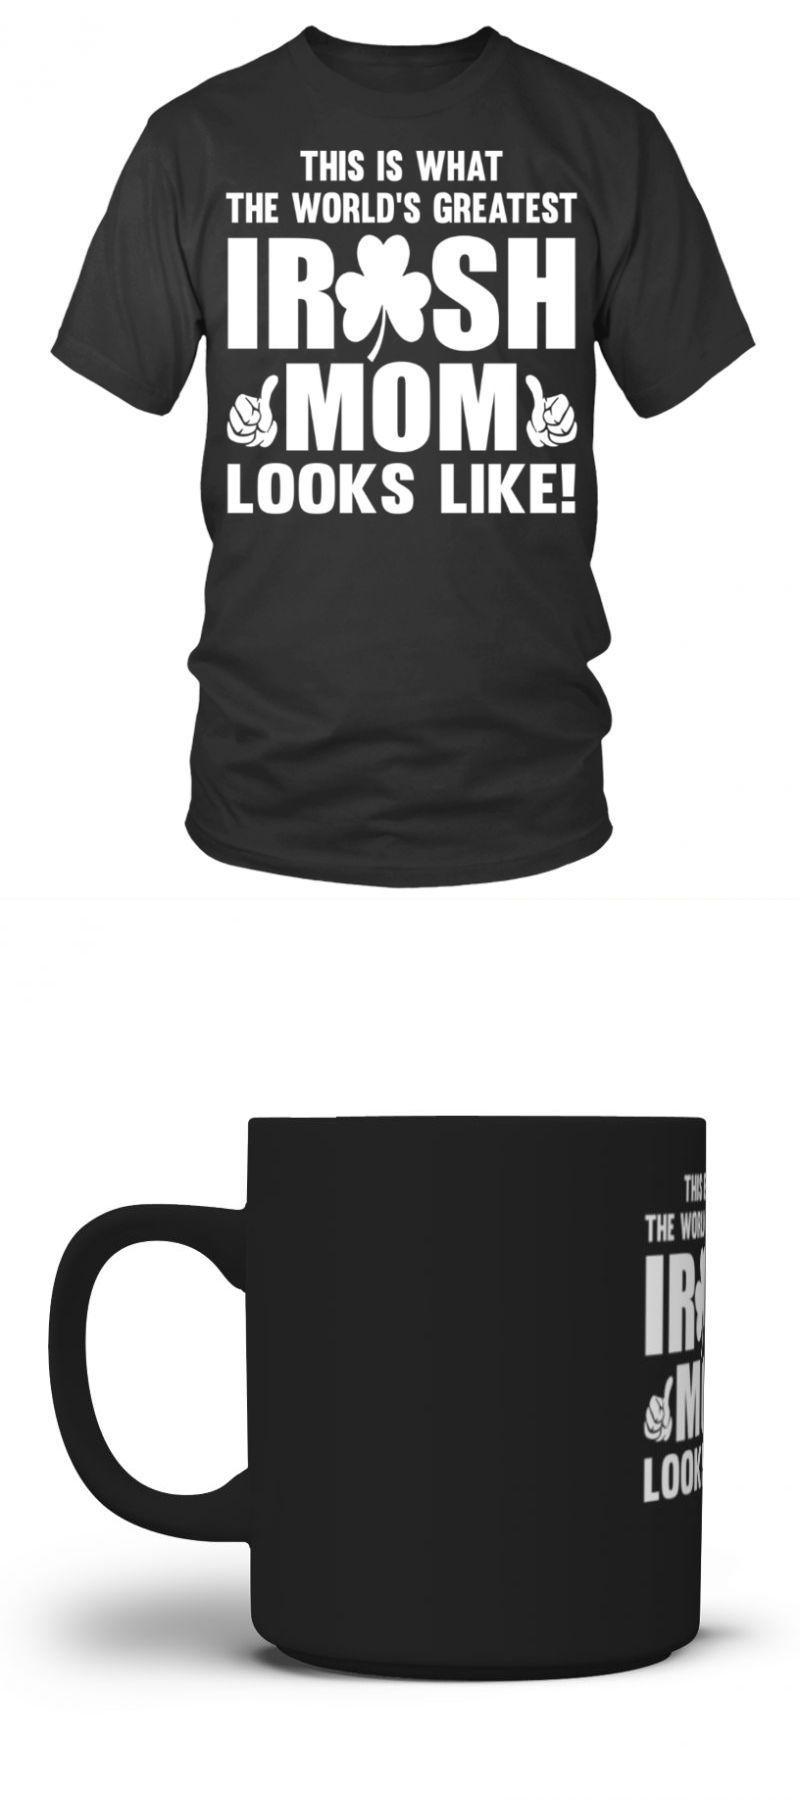 Volleyball Camp T Shirt Irish Mom Iceman Volleyball T Shirt Volleyball T Shirt Designs Shirt Designs Tshirt Designs